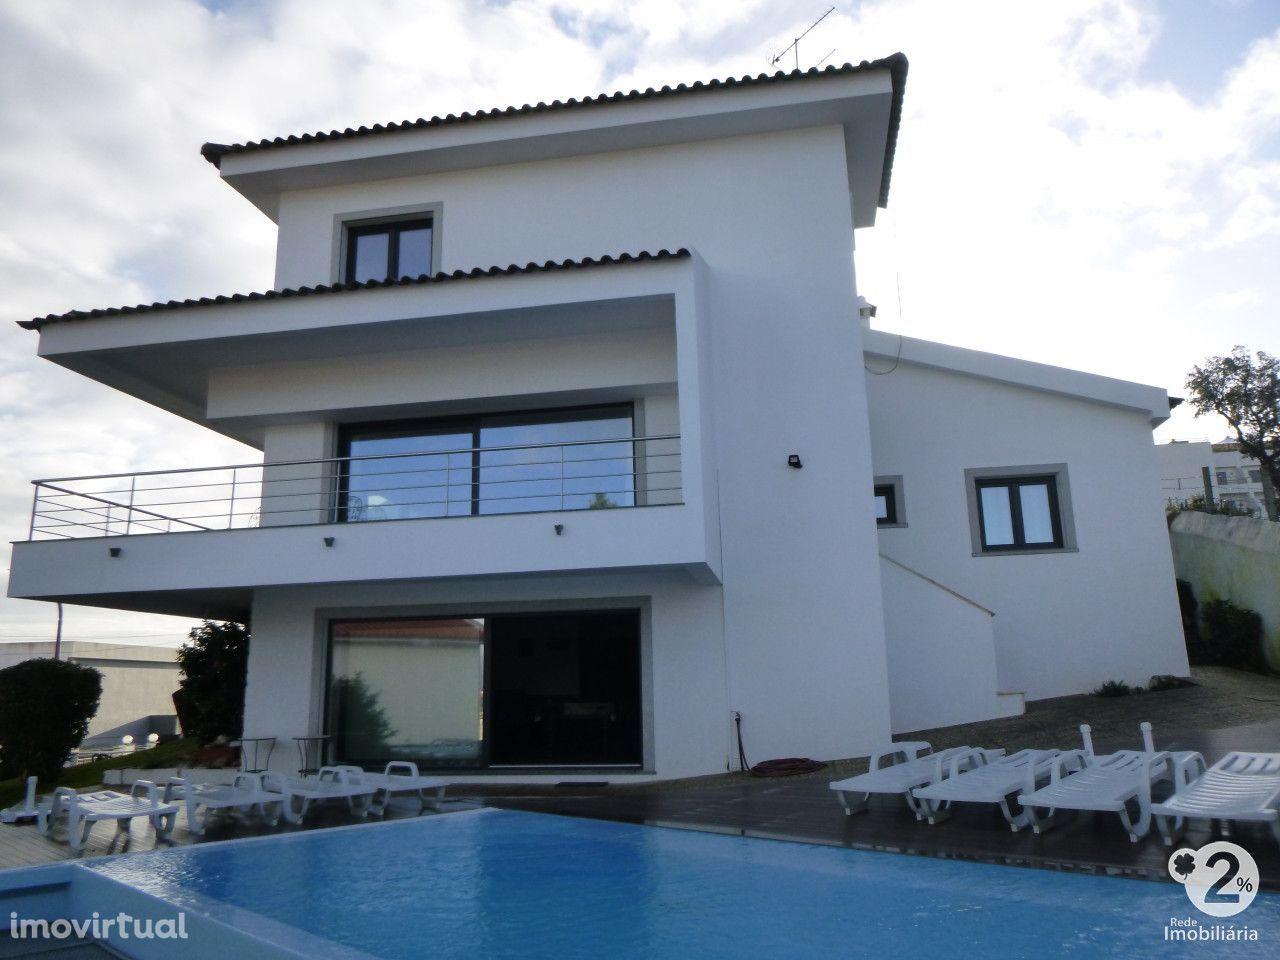 Moradia familiar T5 c/ piscina em Setúbal